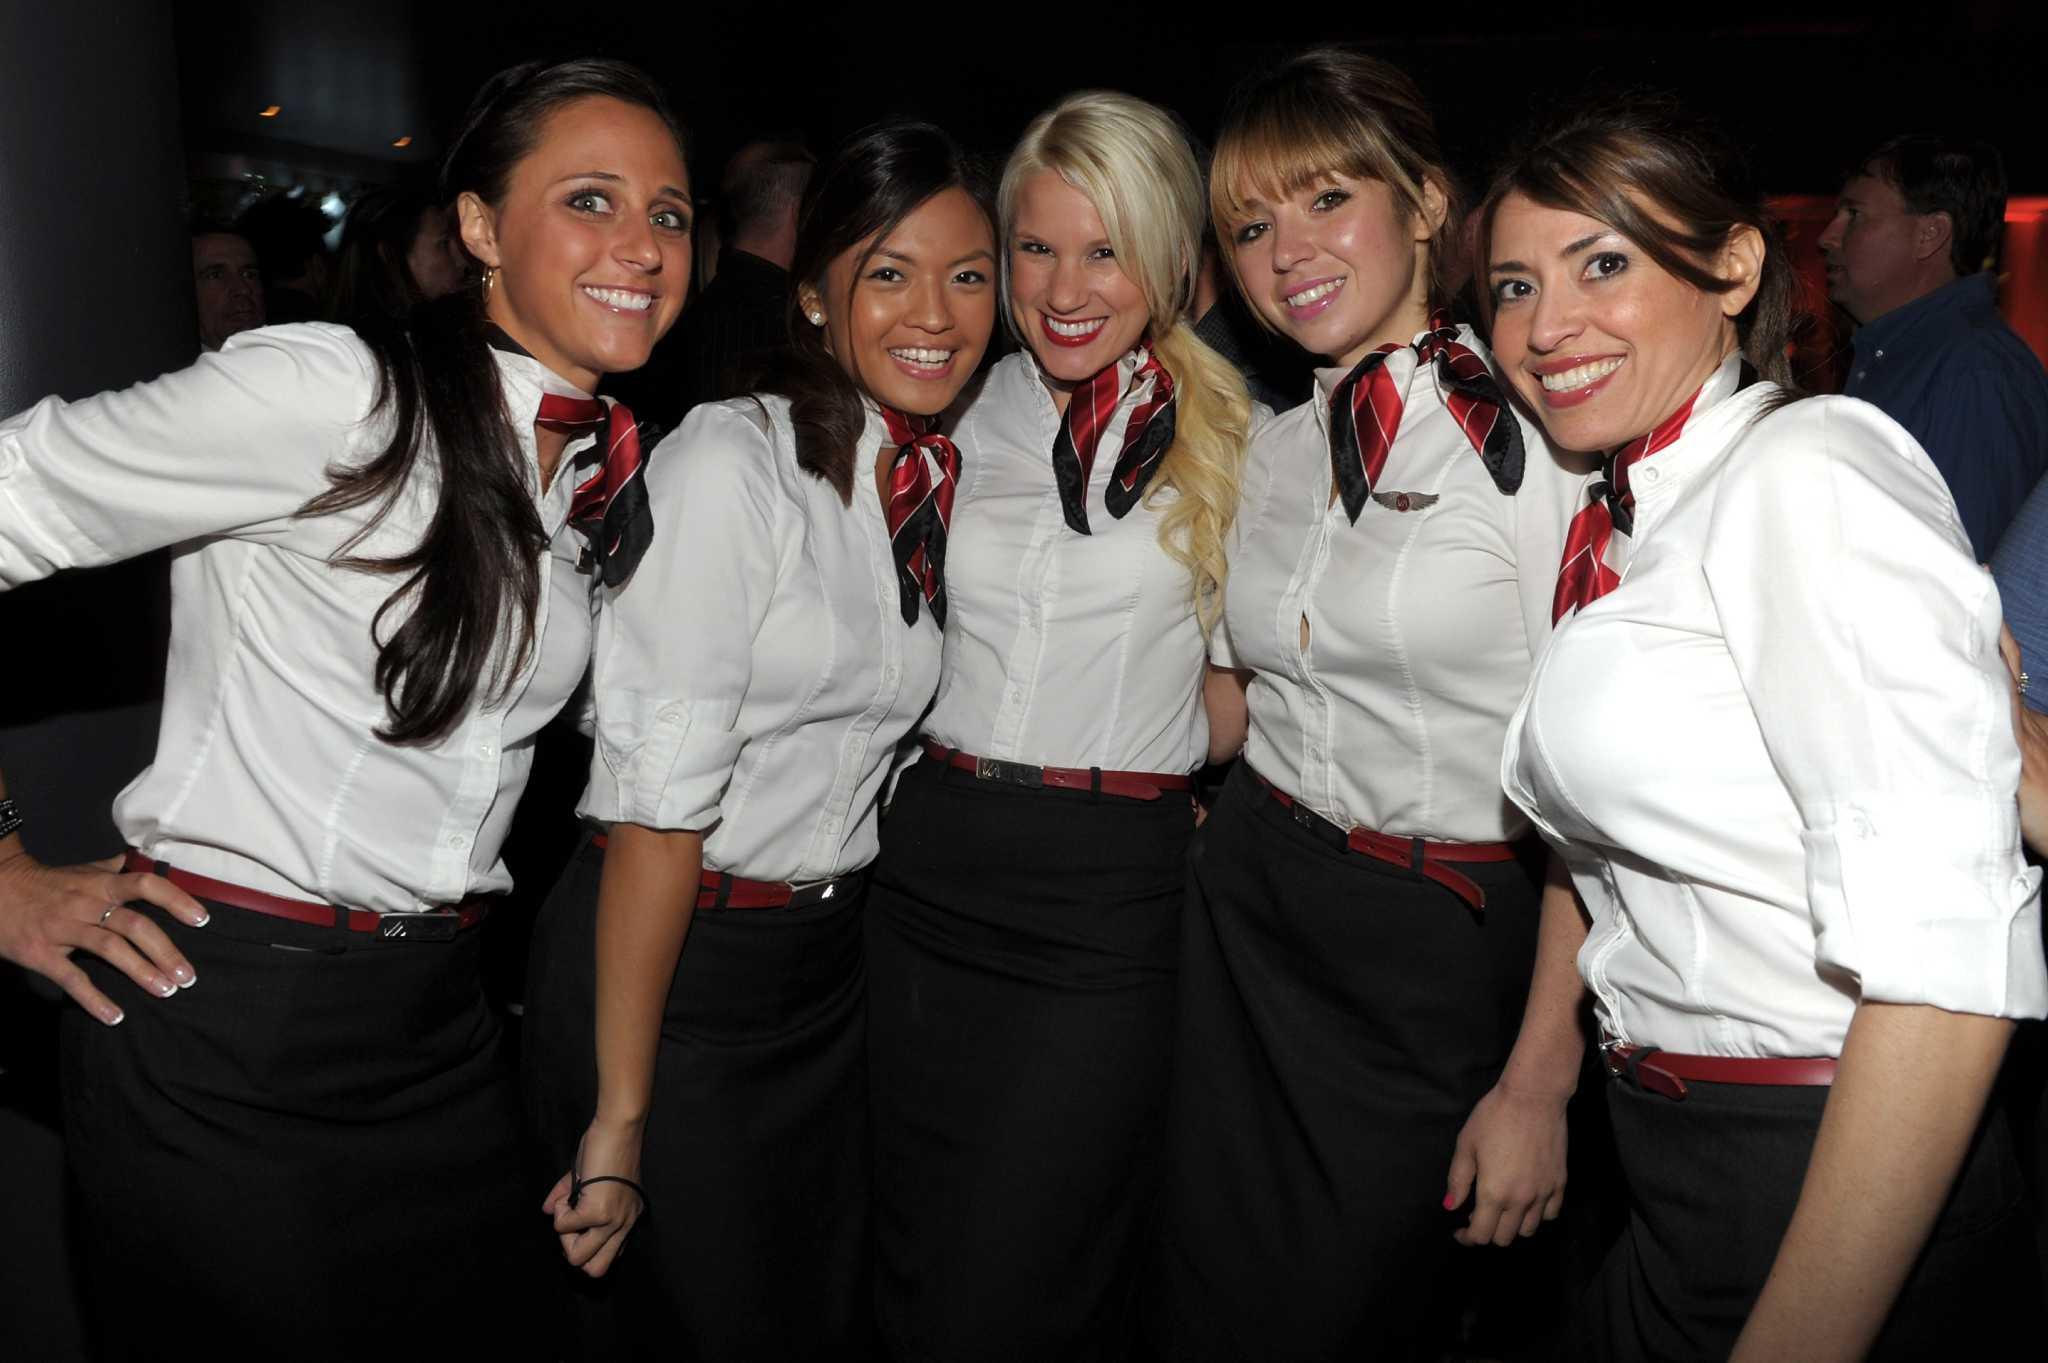 Virgin america boarding pass